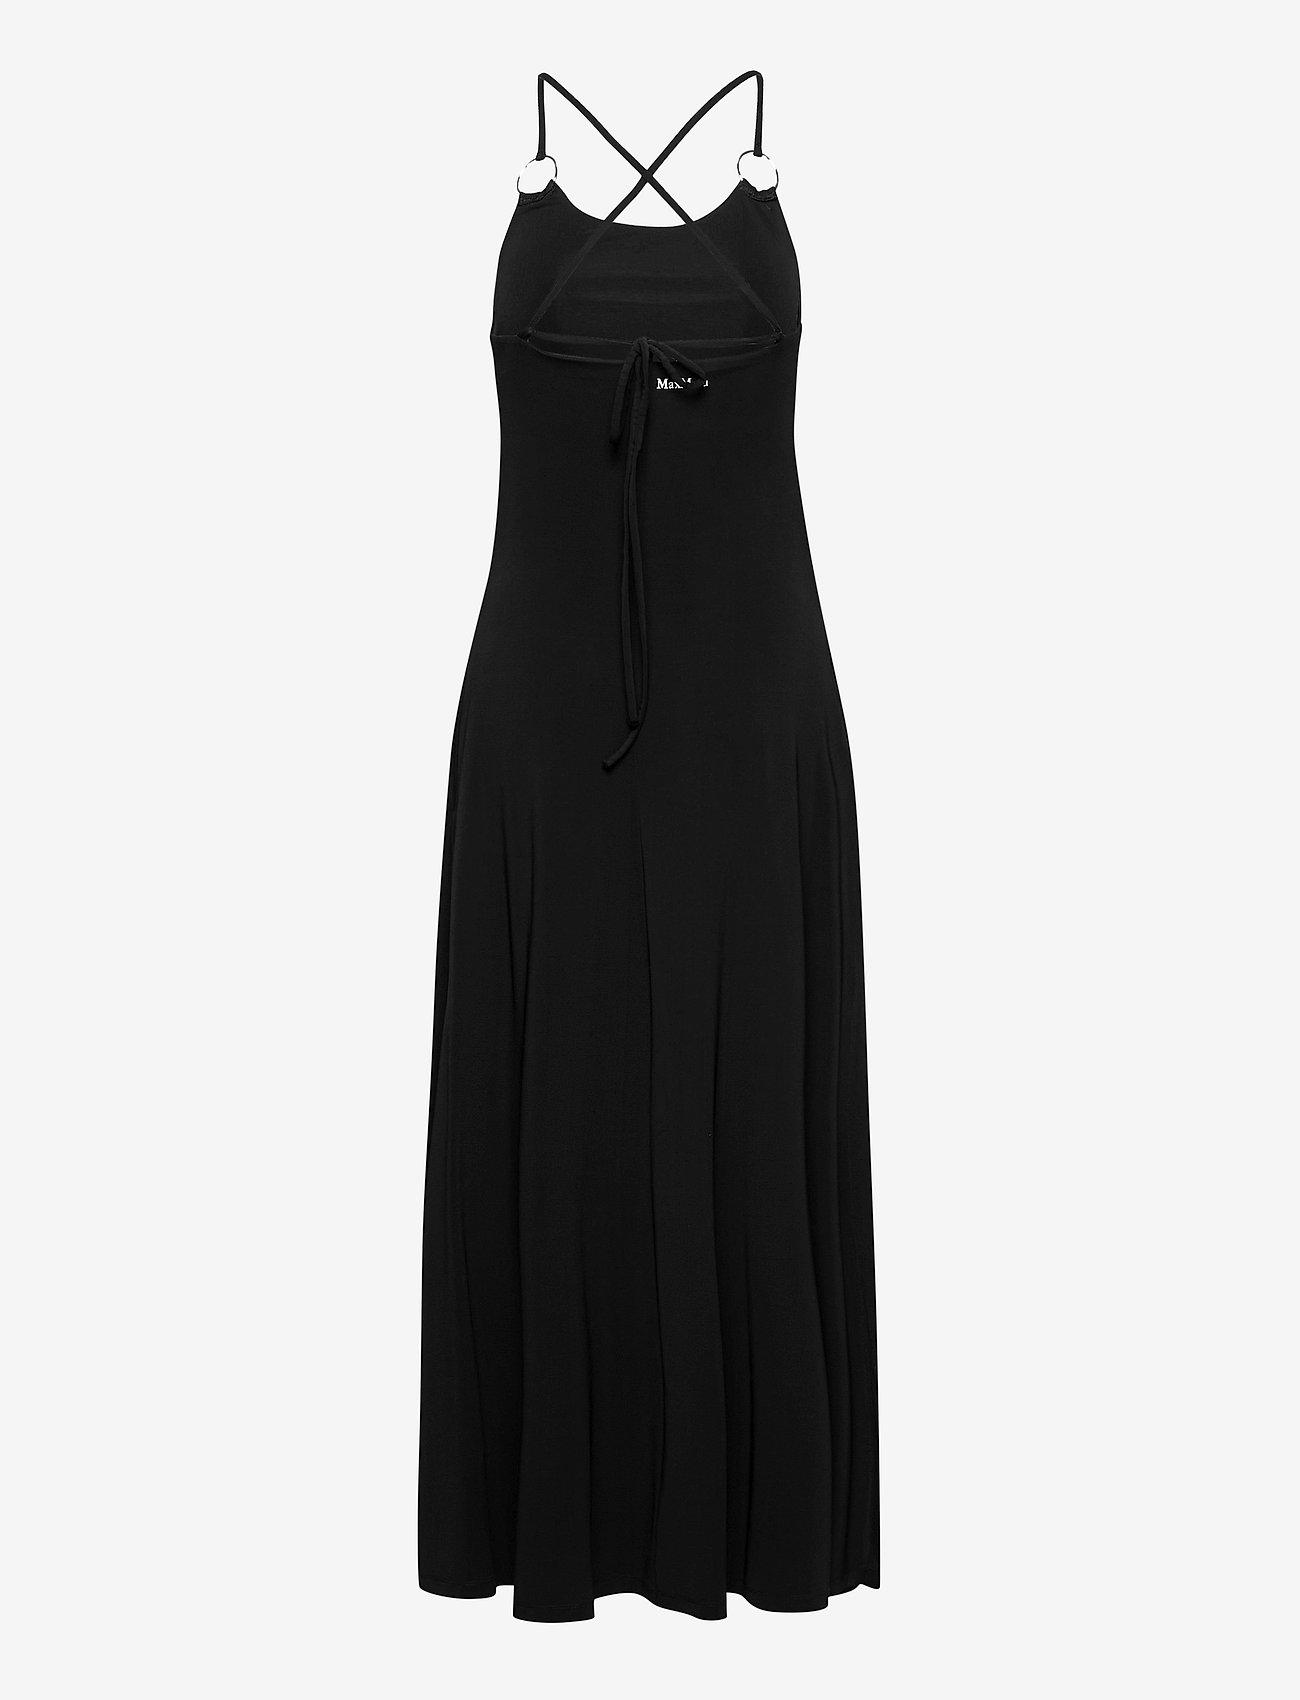 Max Mara Leisure - CREMONA - beachwear - black - 1